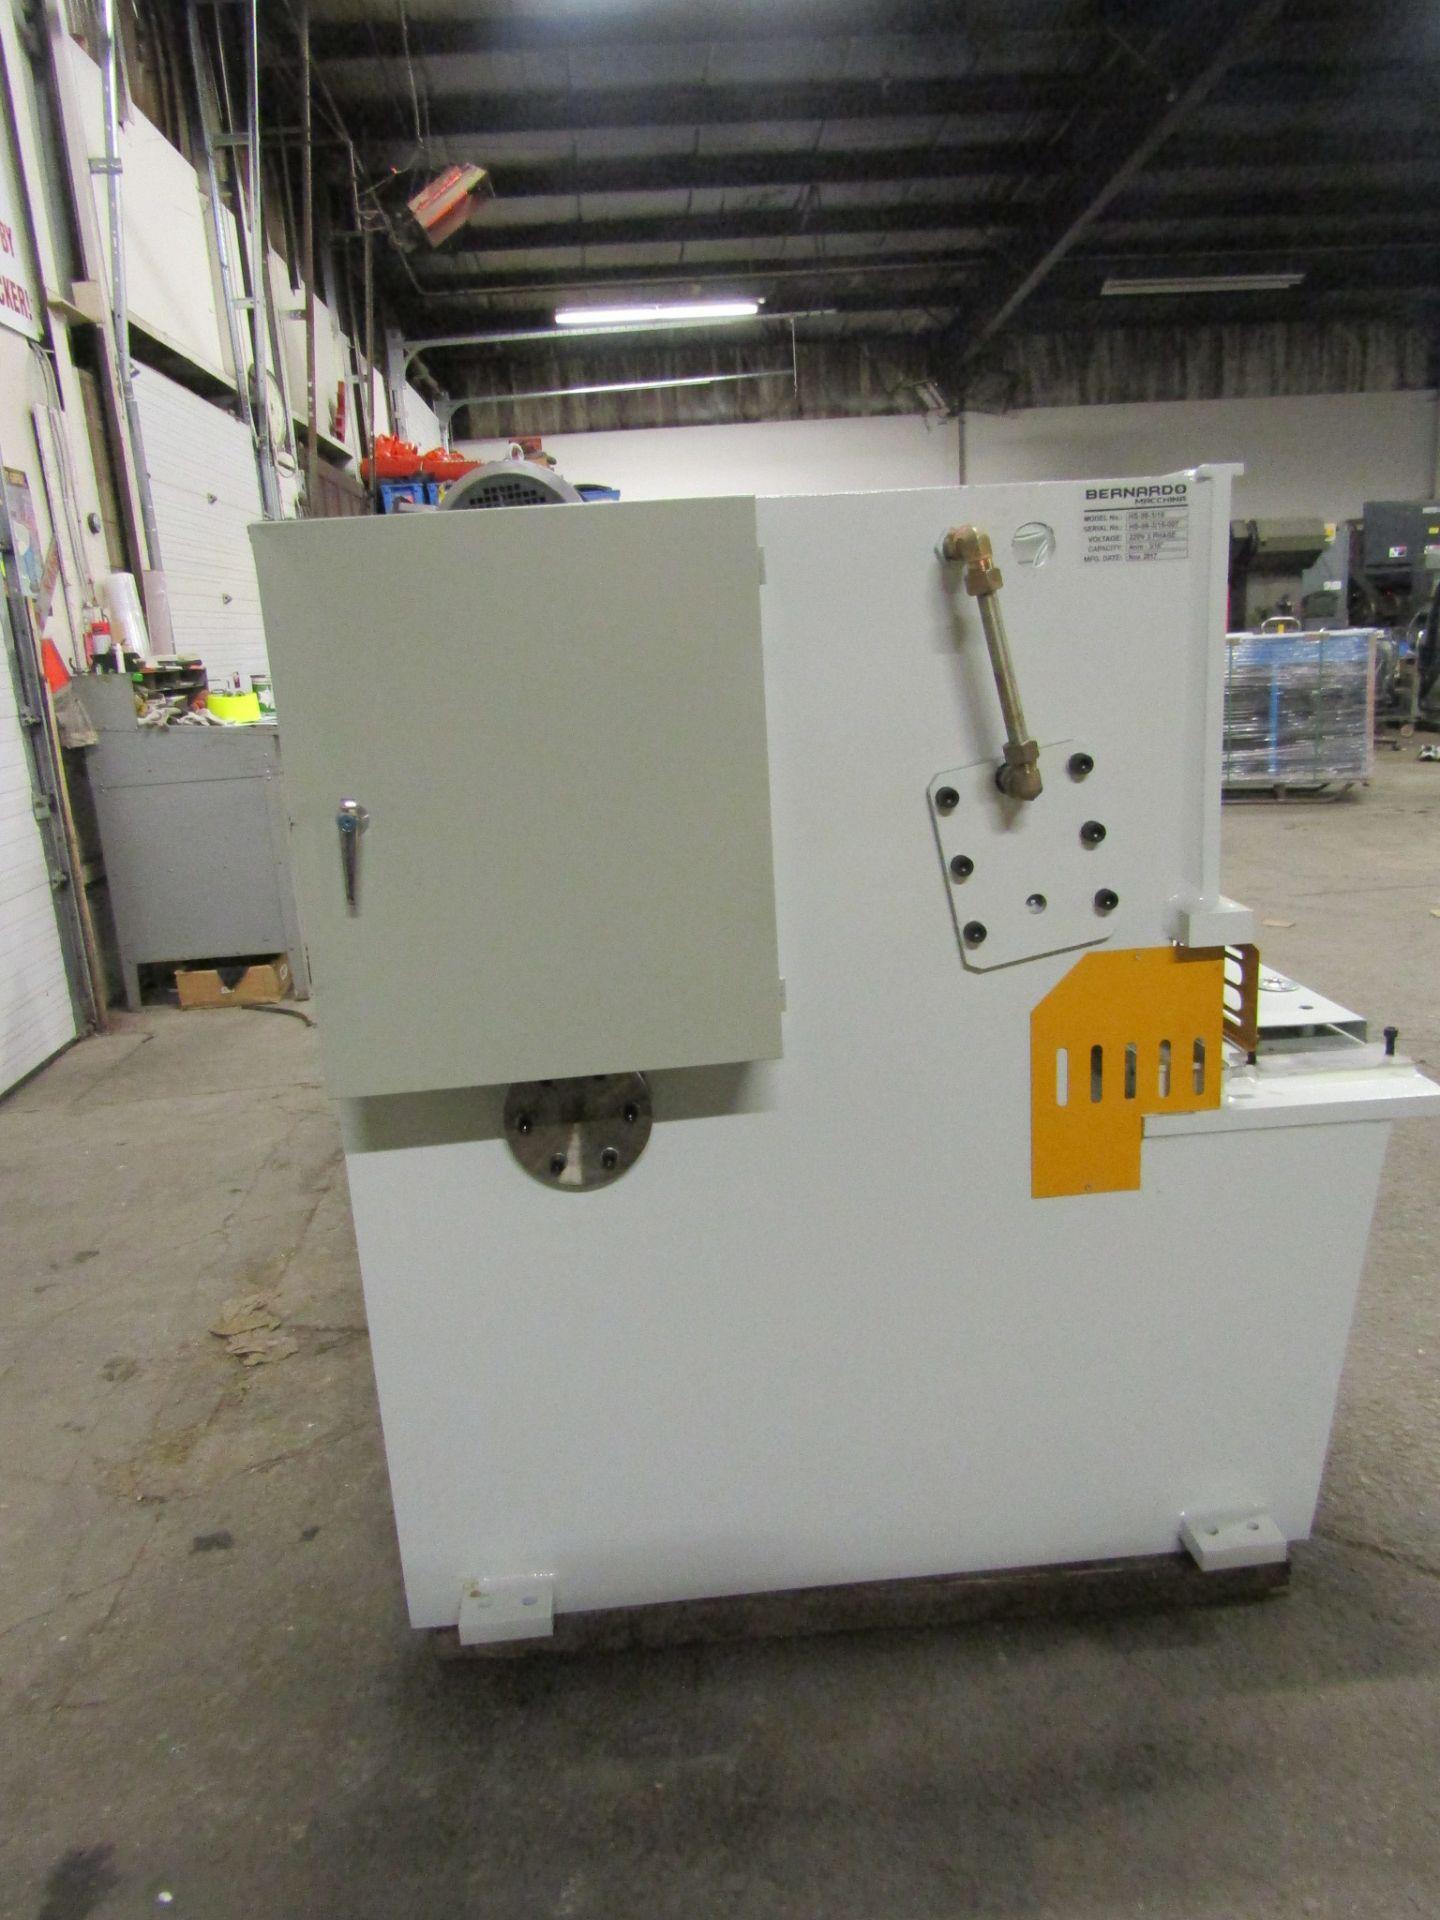 "Bernardo Hydraulic Shear 3/16"" max capacity 98"" width - 480/575V 3 phase MINT UNUSED UNIT complete - Image 5 of 6"